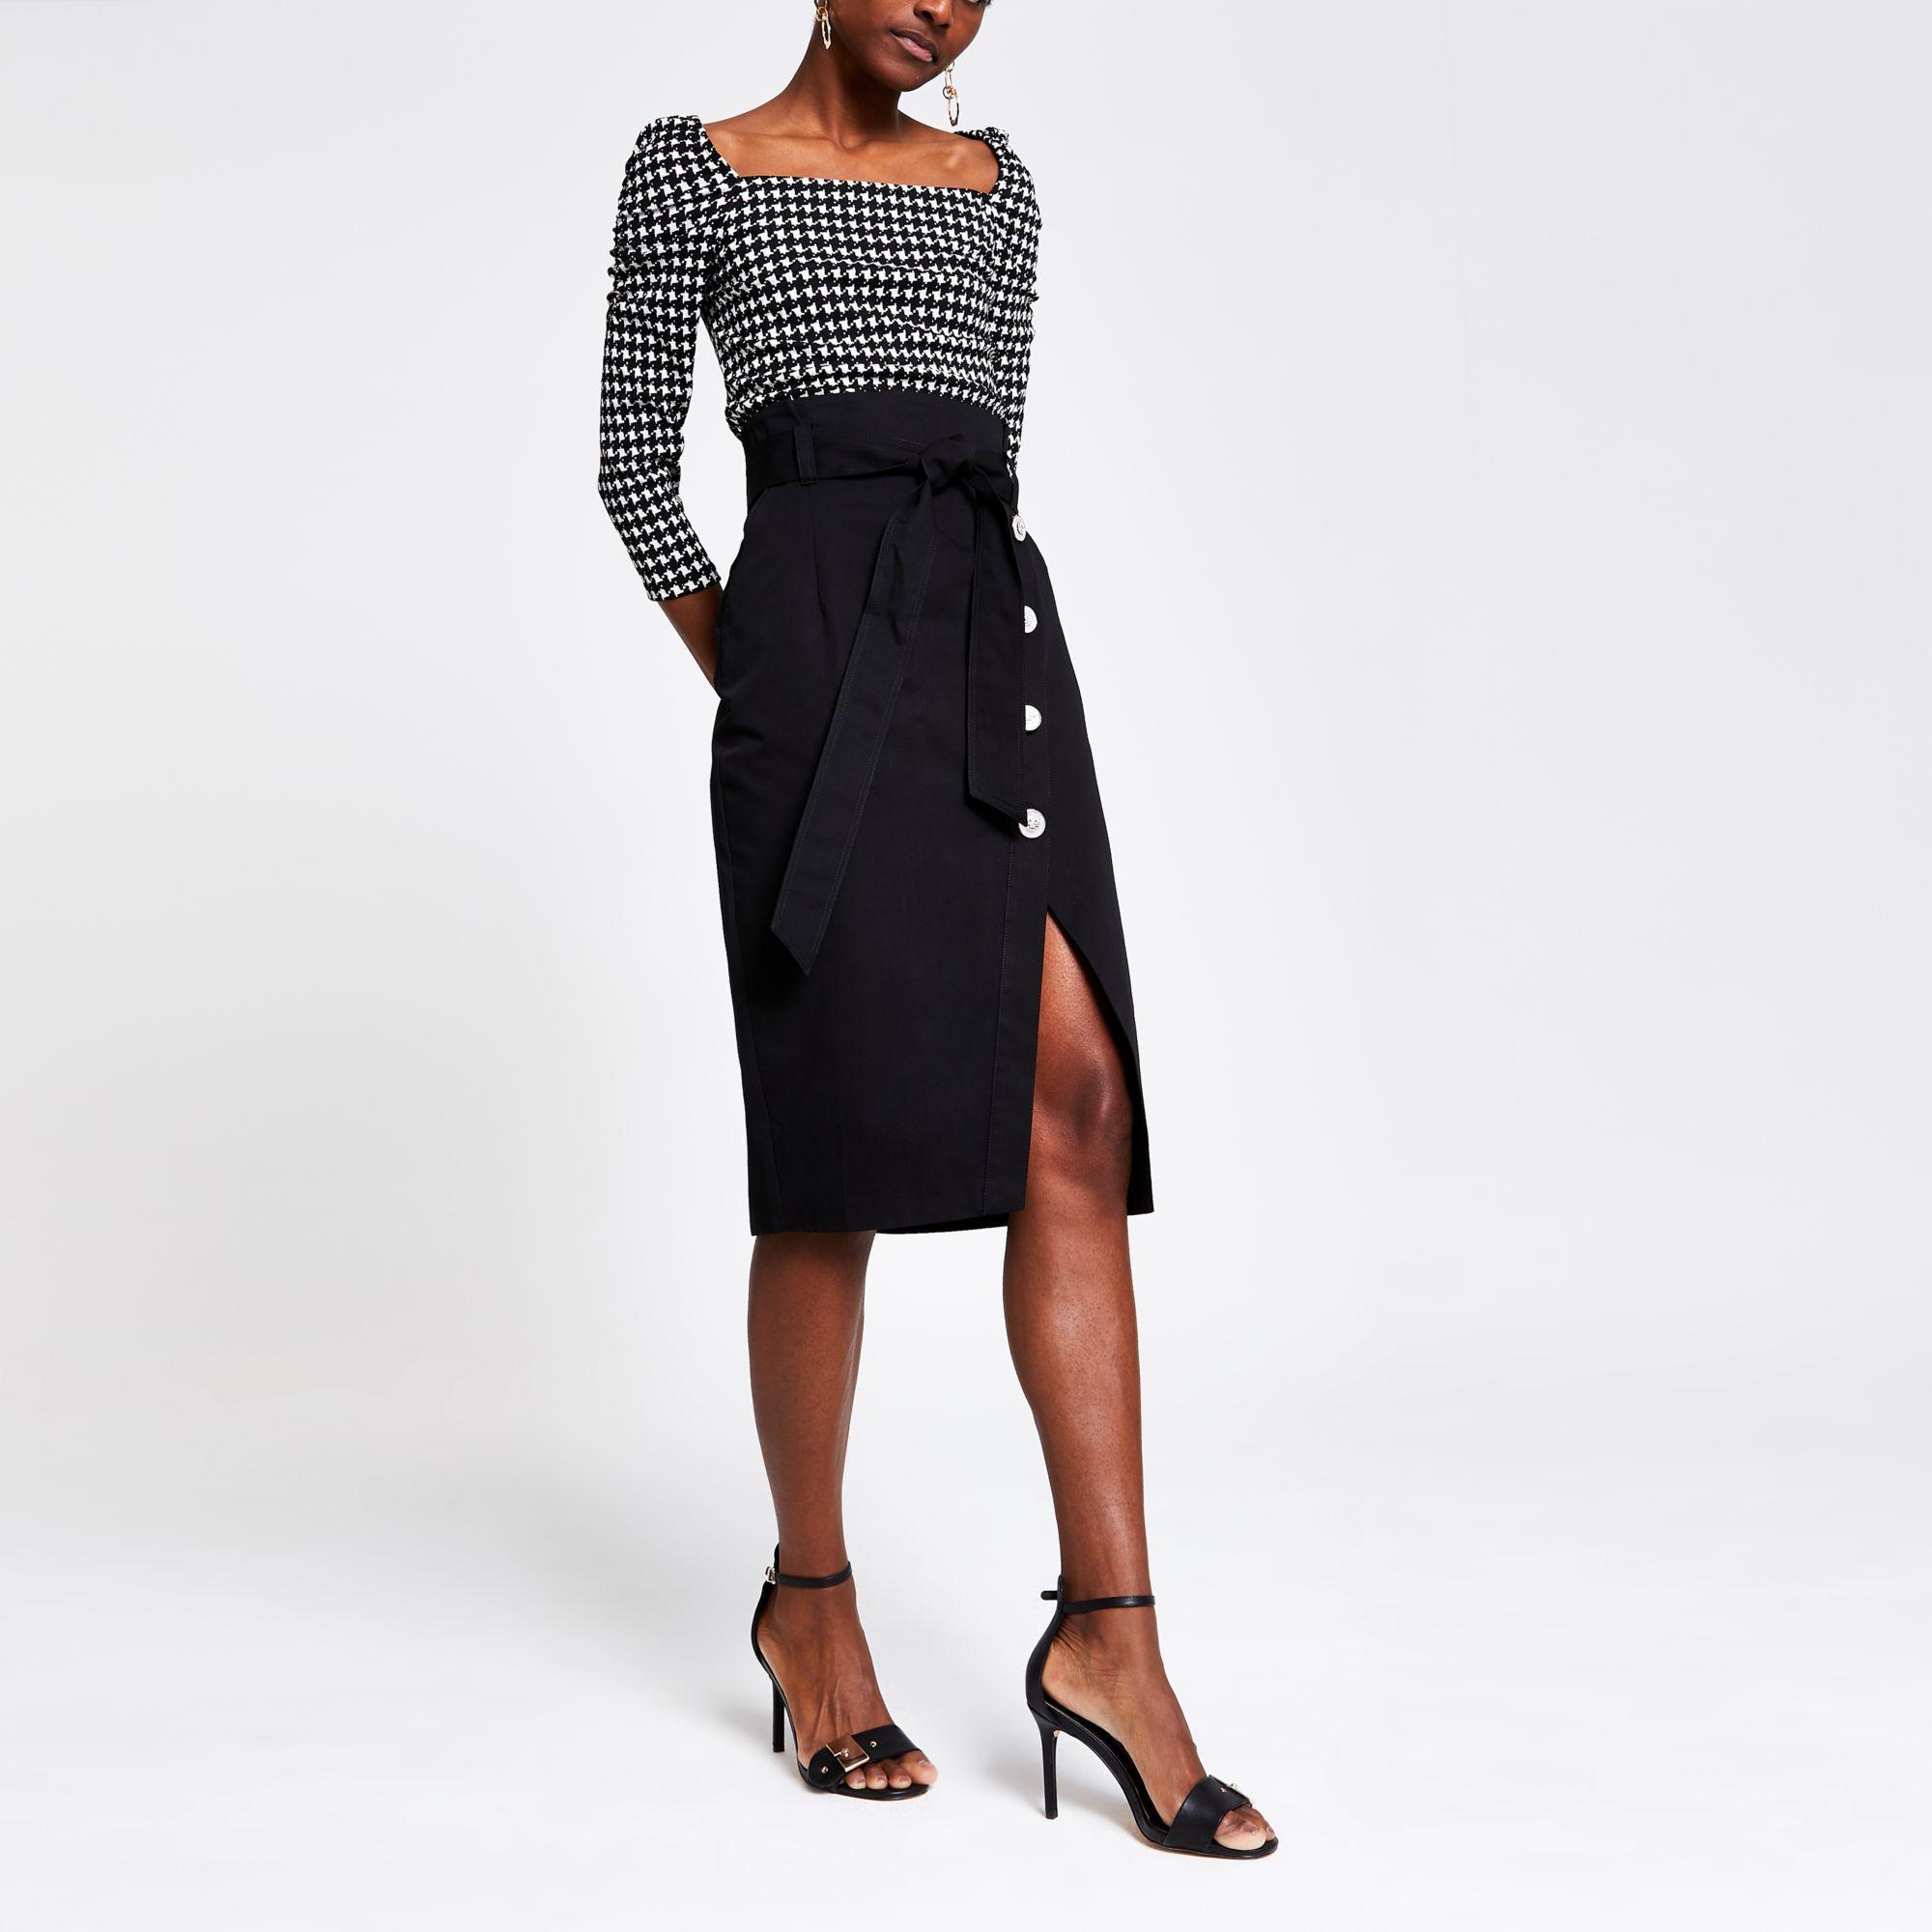 c7a168d62e River Island Tie Waist Pencil Skirt in Black - Lyst